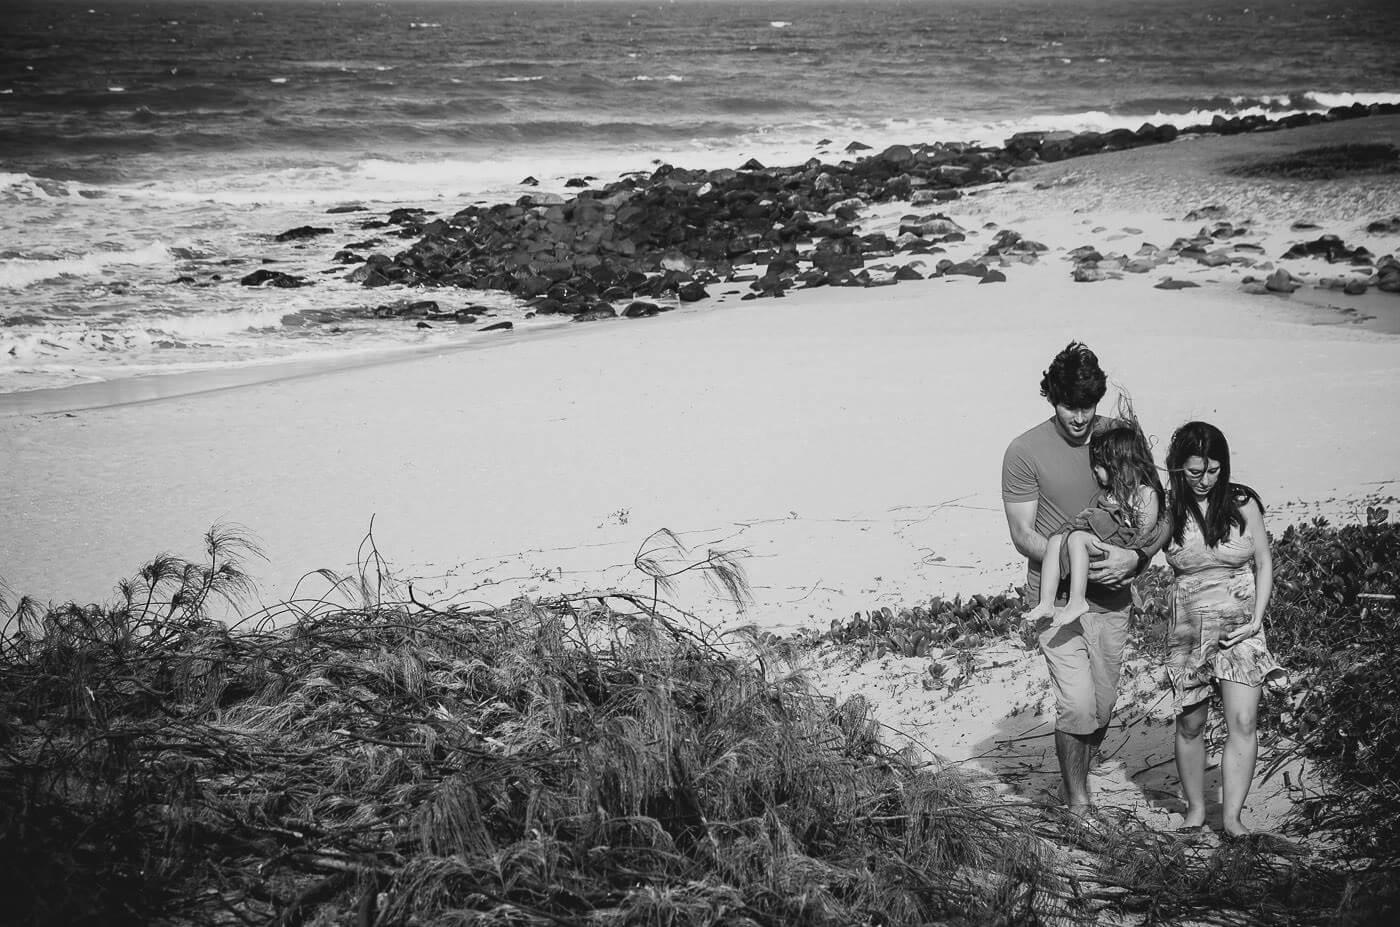 Ensaio Gestante em Garopaba: Milena Família  lifestyle gestante fotografia lifestyle de família Ensaio gestante na praia ensaio gestante em Garopaba ensaio família day in life